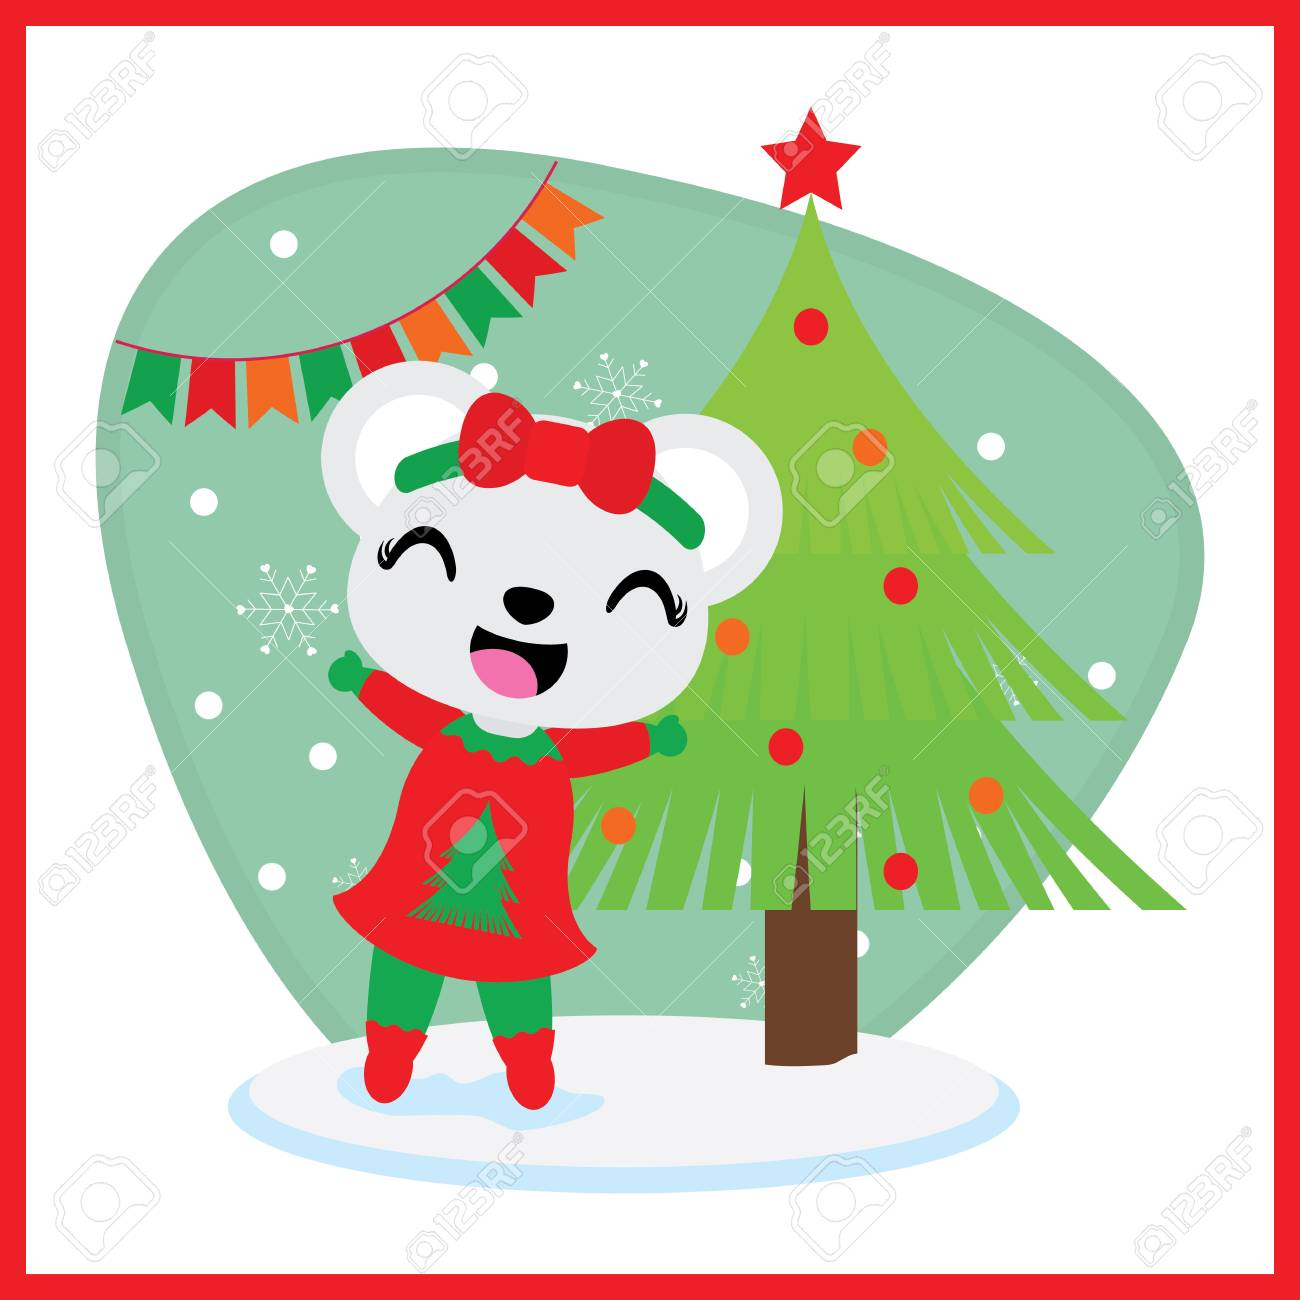 Cute bear girl besides Xmas tree vector cartoon illustration for Christmas card design, wallpaper and